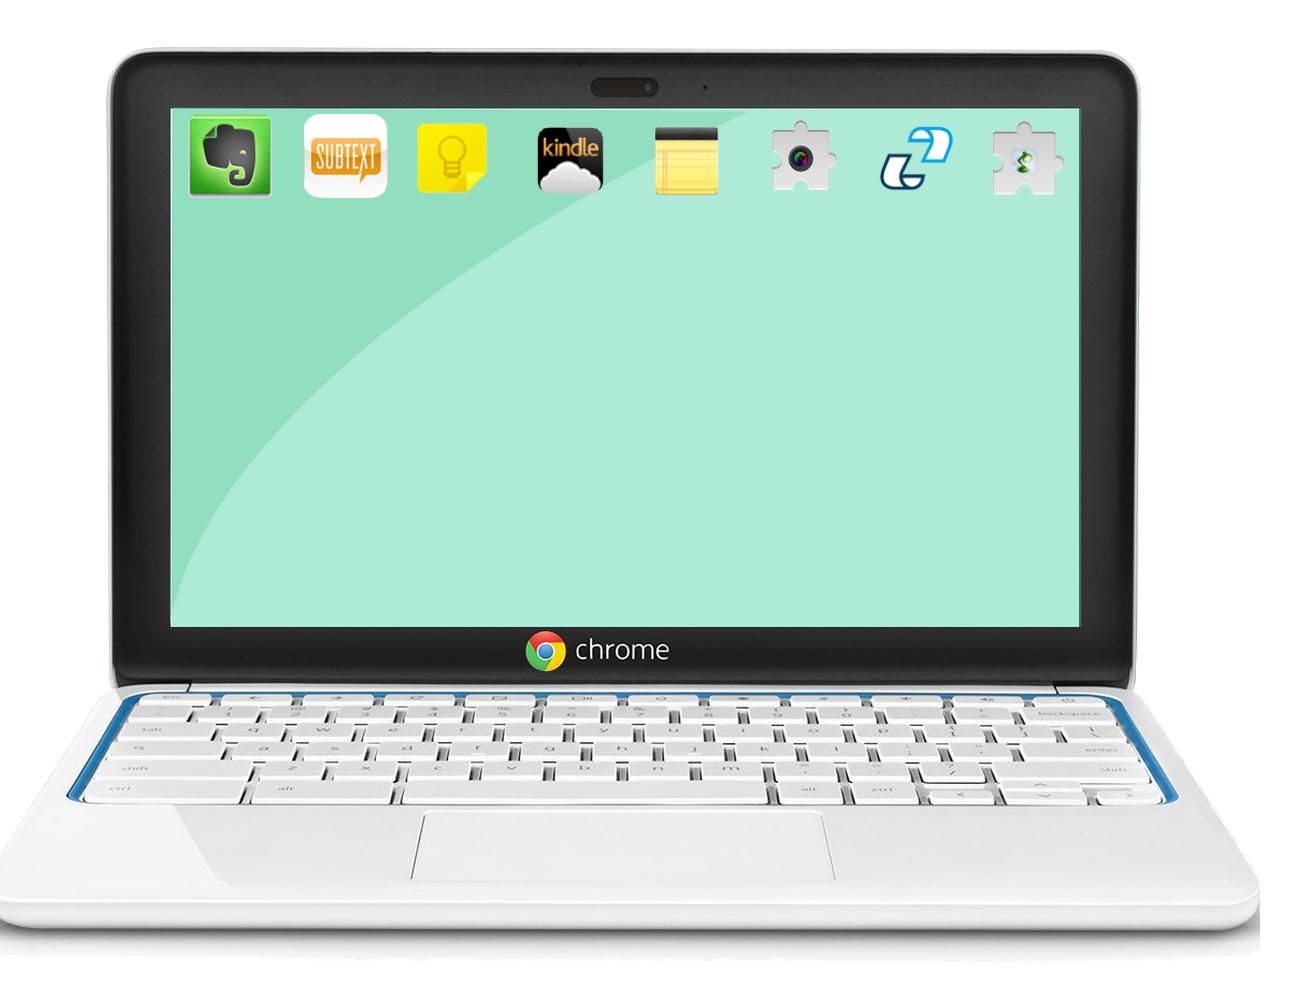 How to Pin a Website as an App to the Chromebook Taskbar